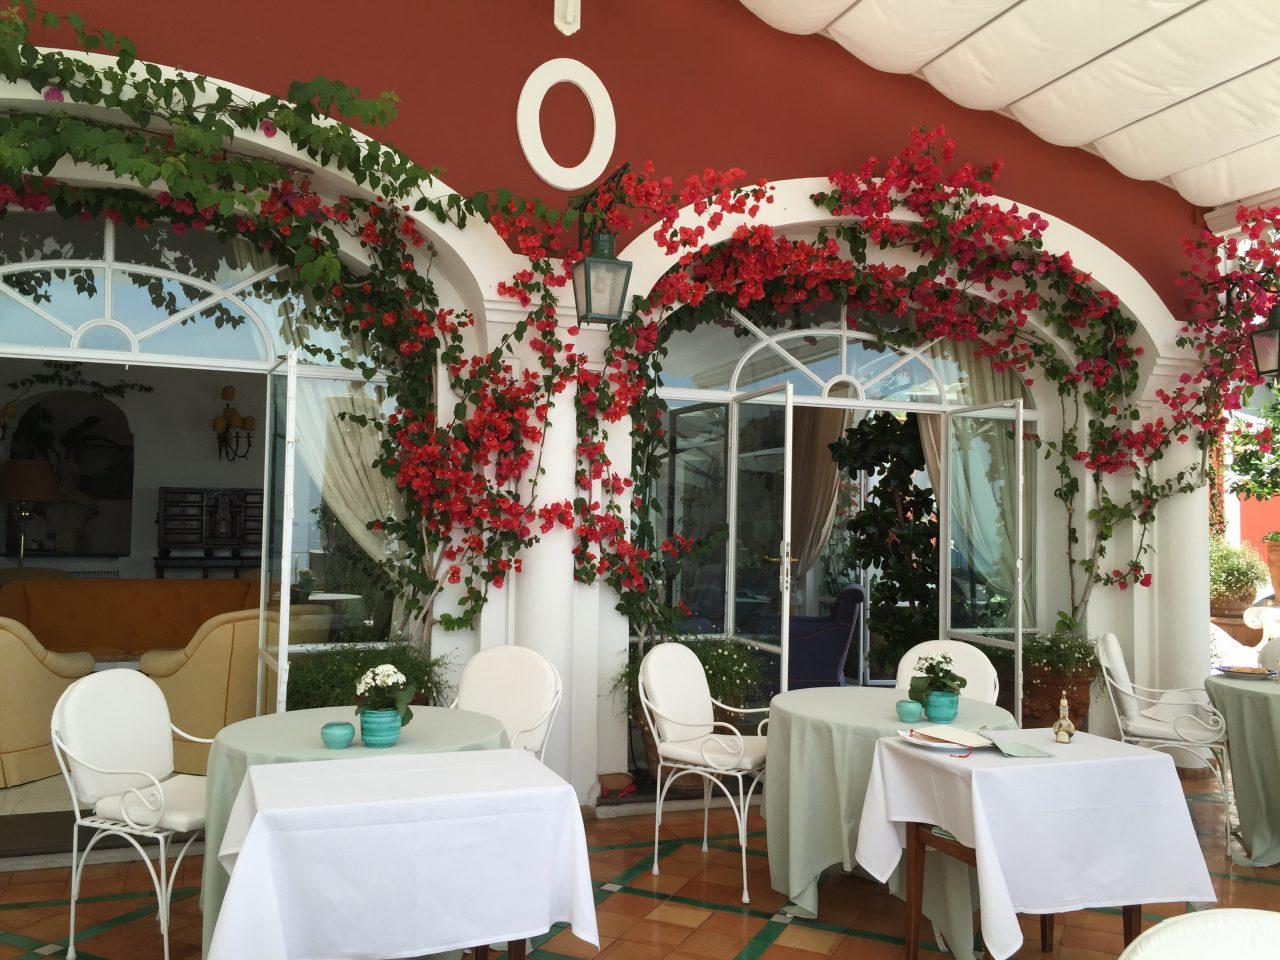 Lunch at La Sponda Restaurant